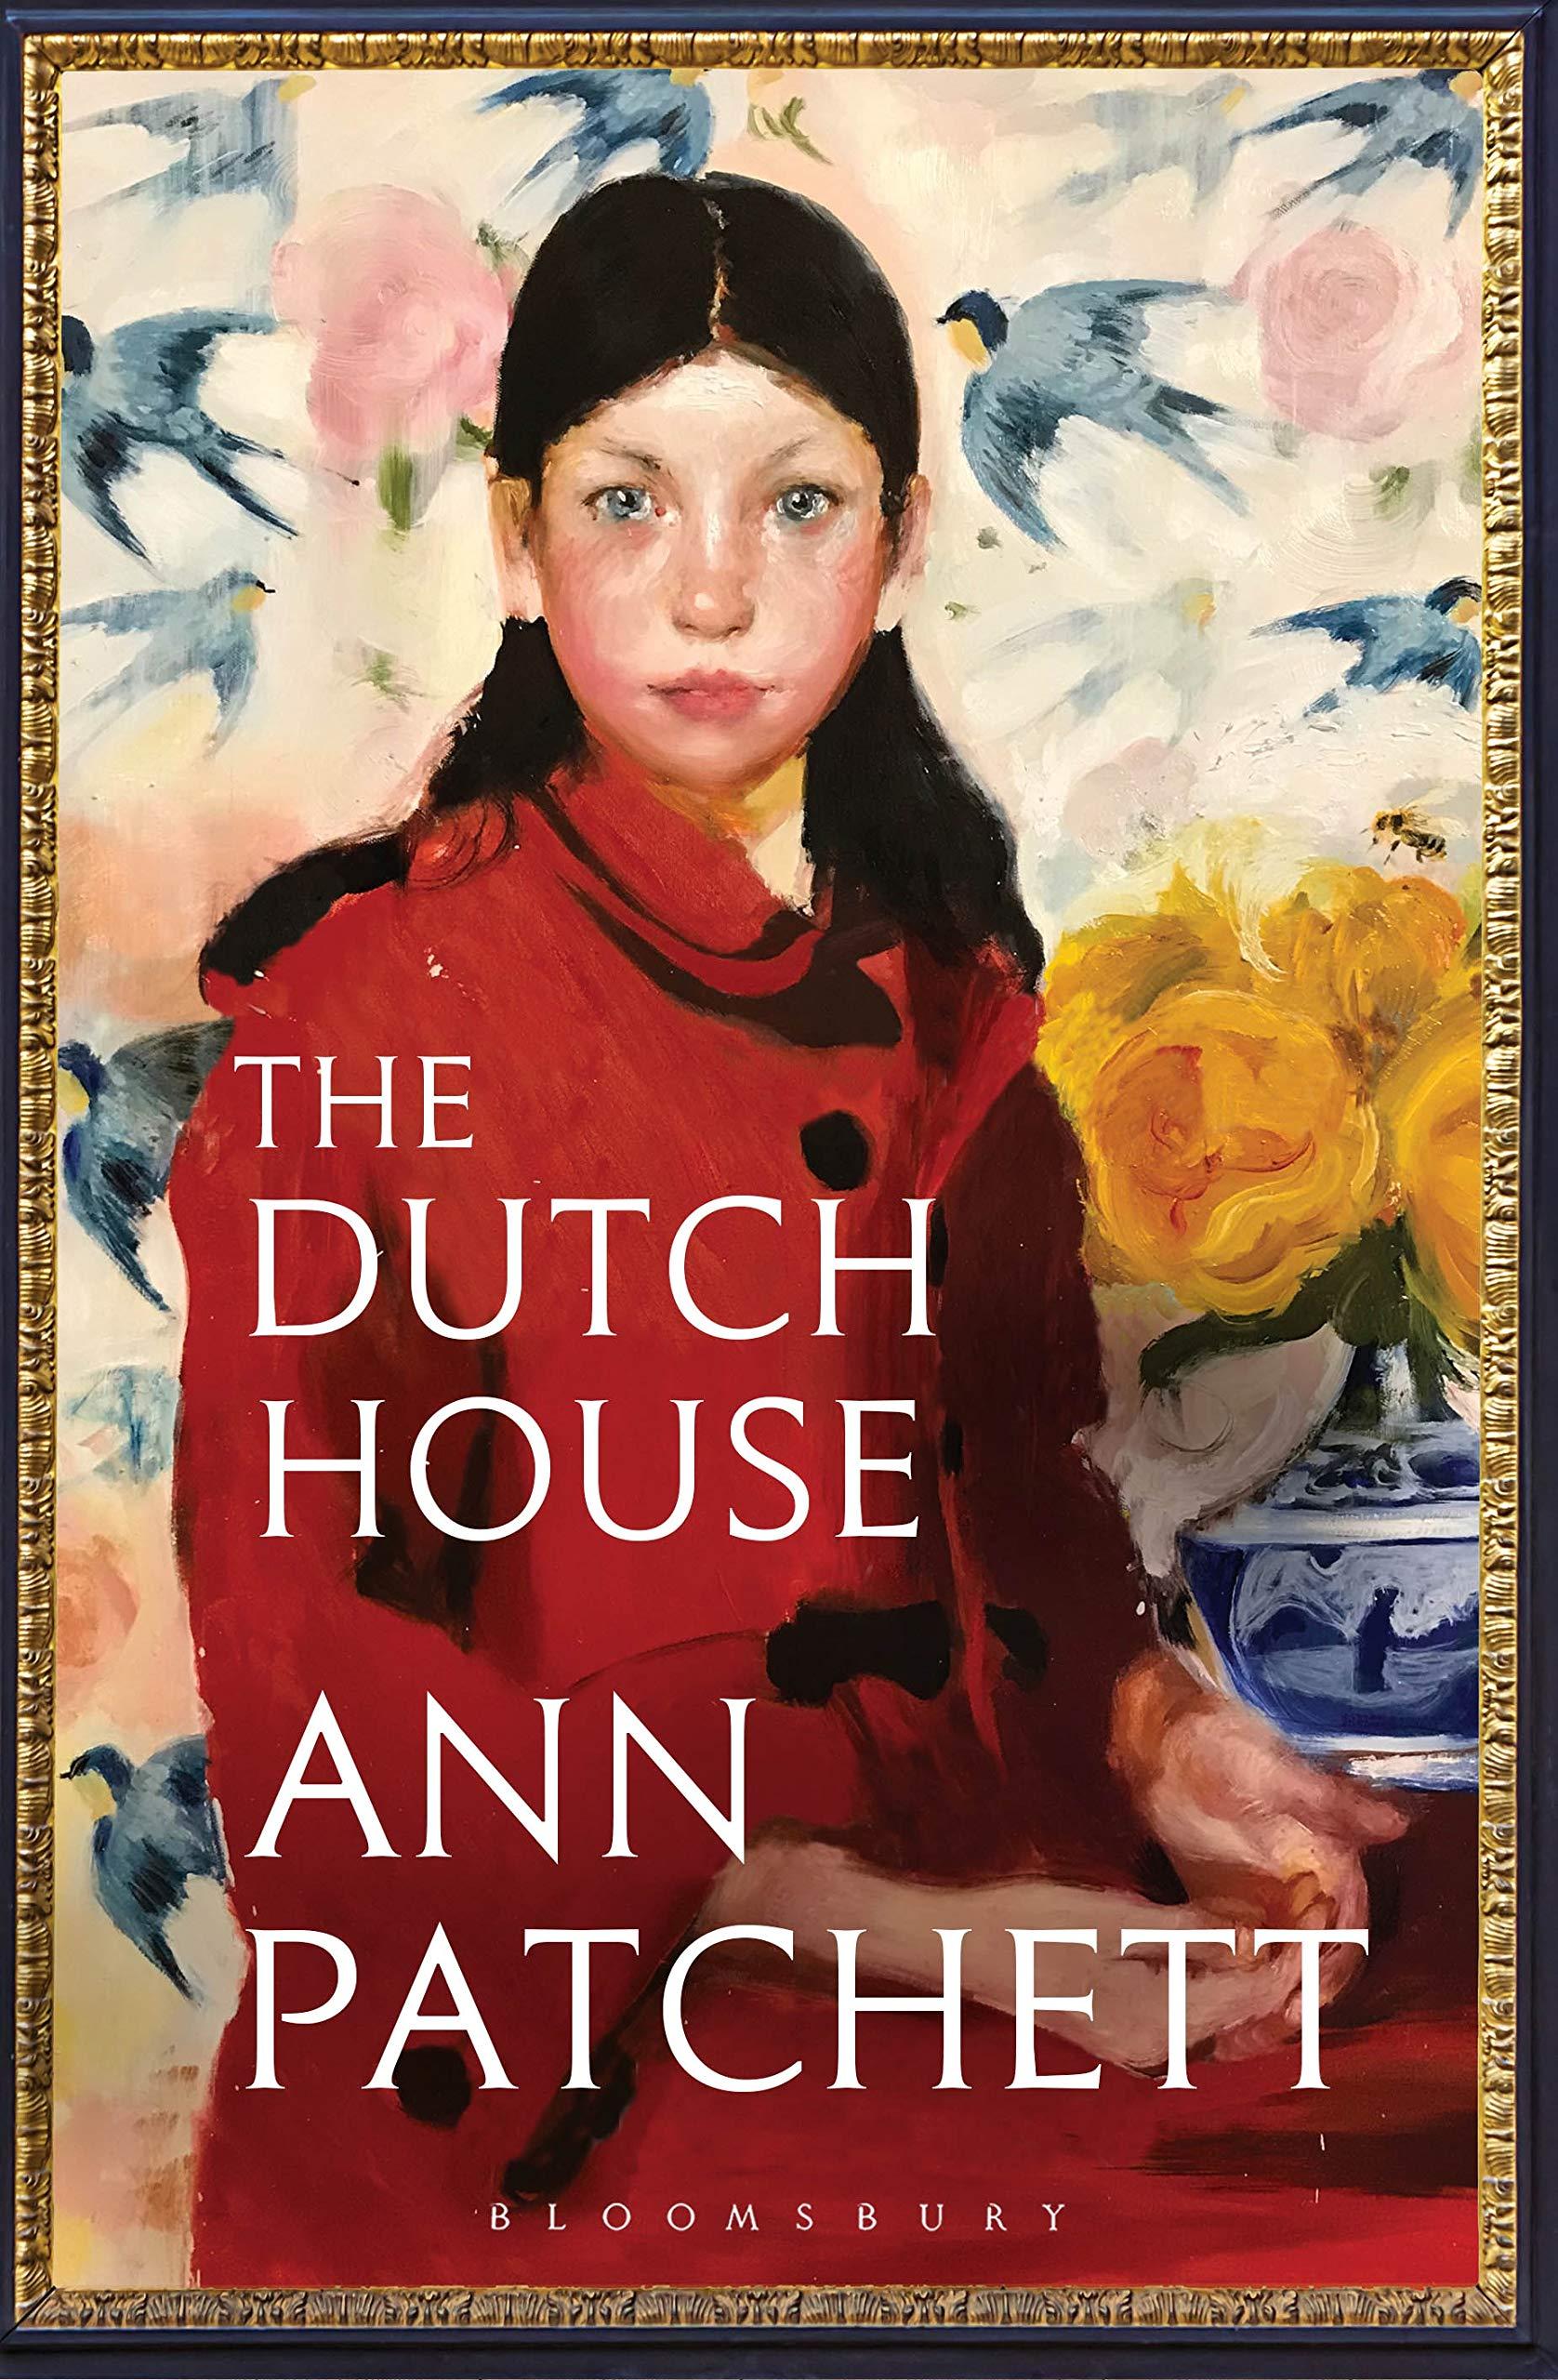 The Dutch House: Patchett, Ann: 9781526614964: Amazon.com: Books